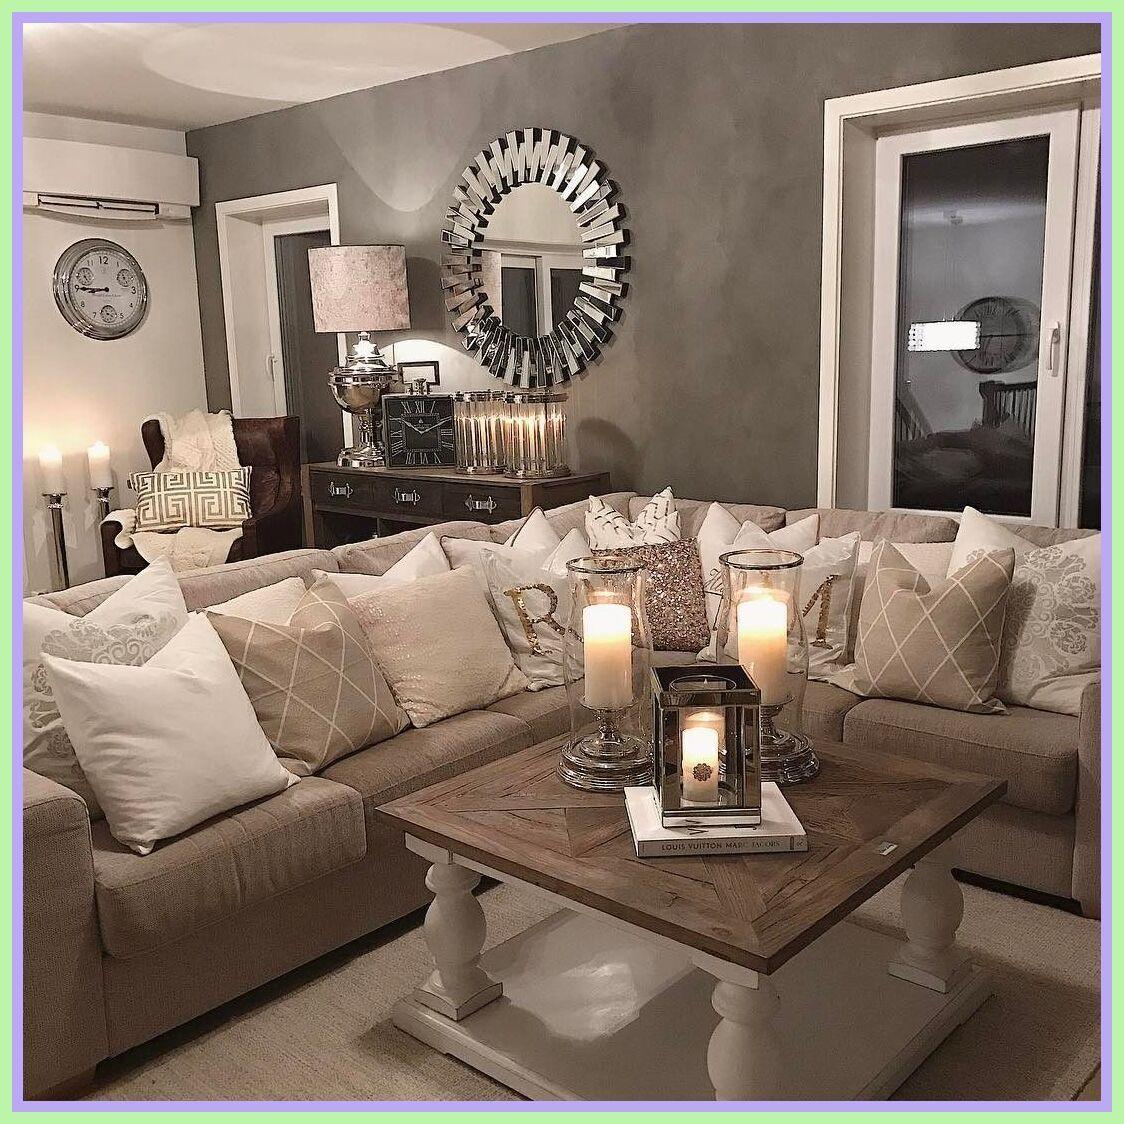 63 Reference Of Grey Sofa In Beige Room In 2020 Beige Li